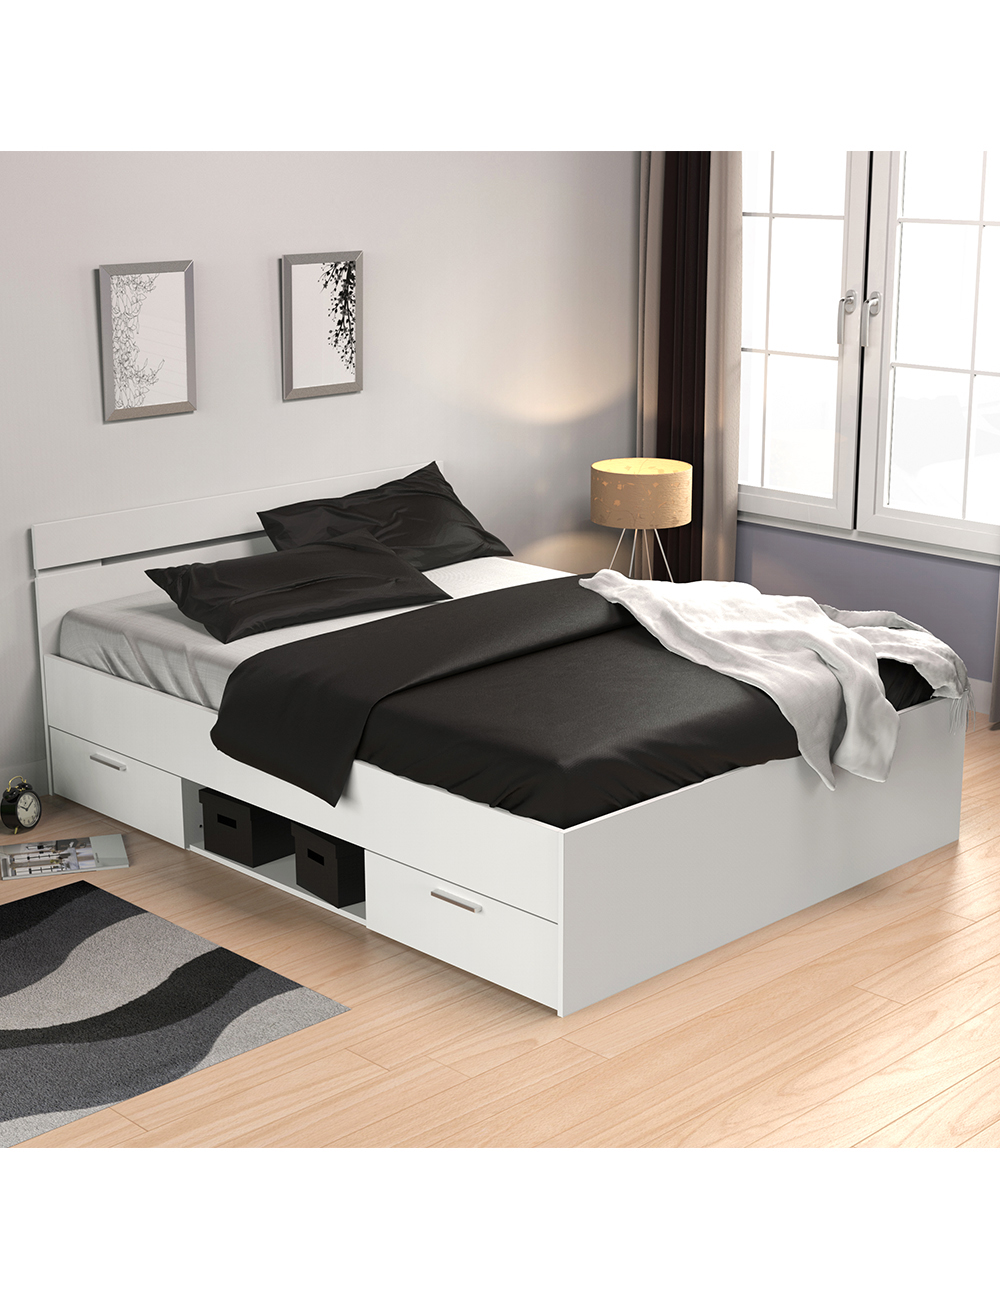 funktionsbett liberty 140 x 200 cm. Black Bedroom Furniture Sets. Home Design Ideas